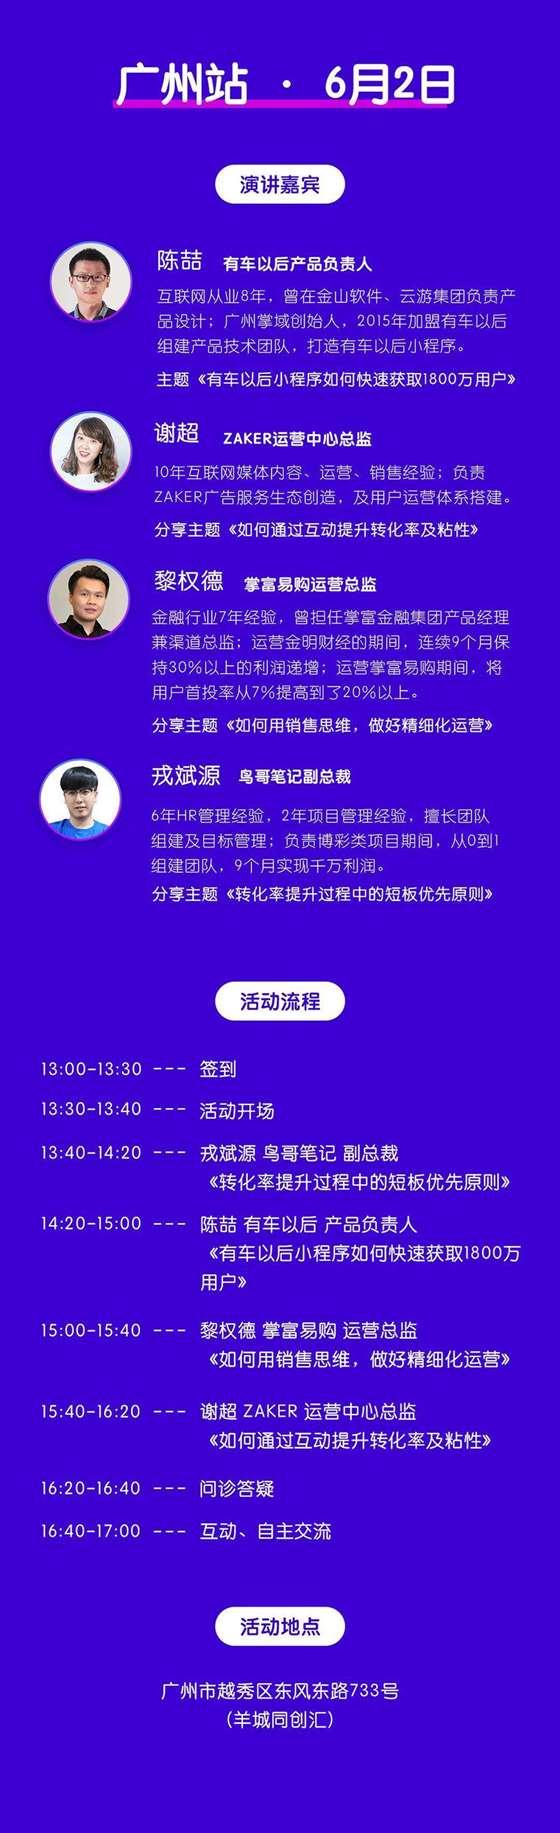 D:\Desktop\2018年Q2活动物料需求-广州站.png